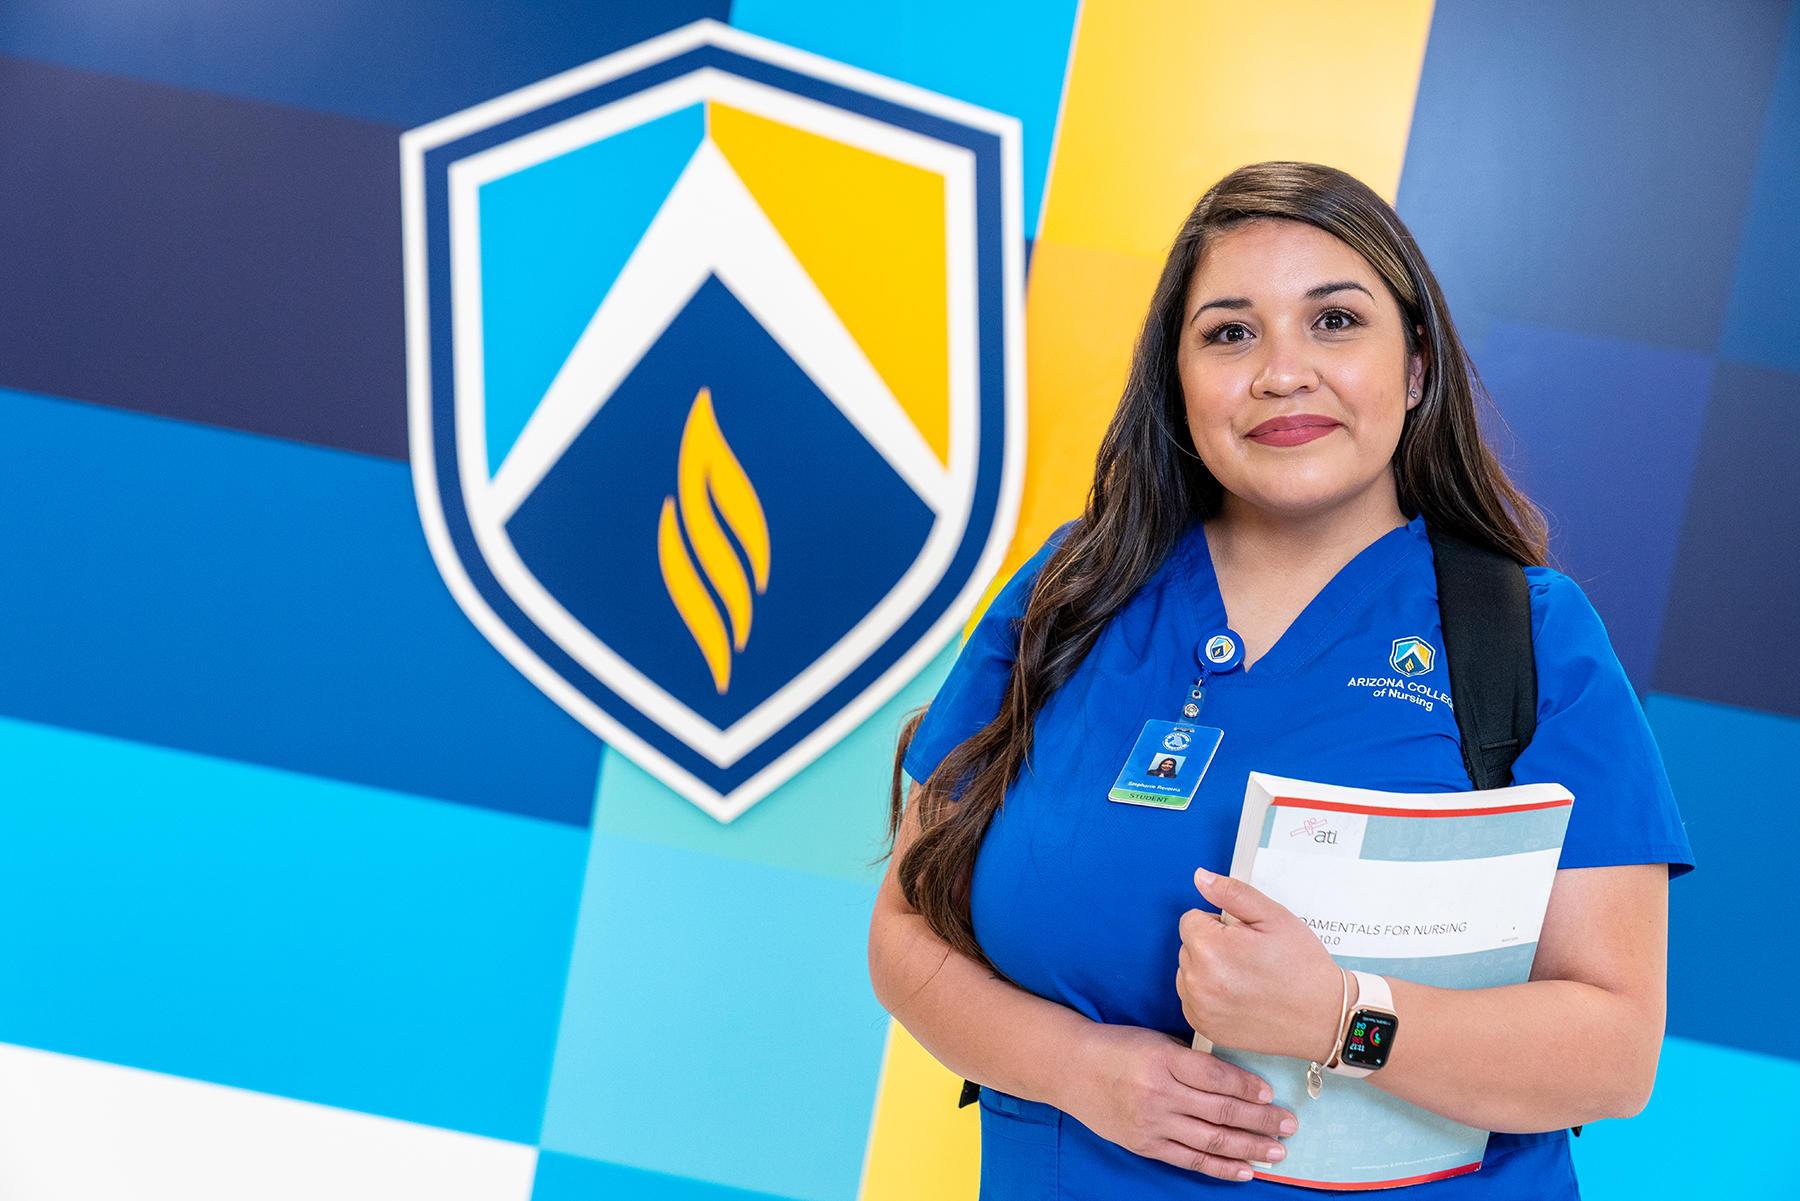 Arizona College of Nursing - Southfield